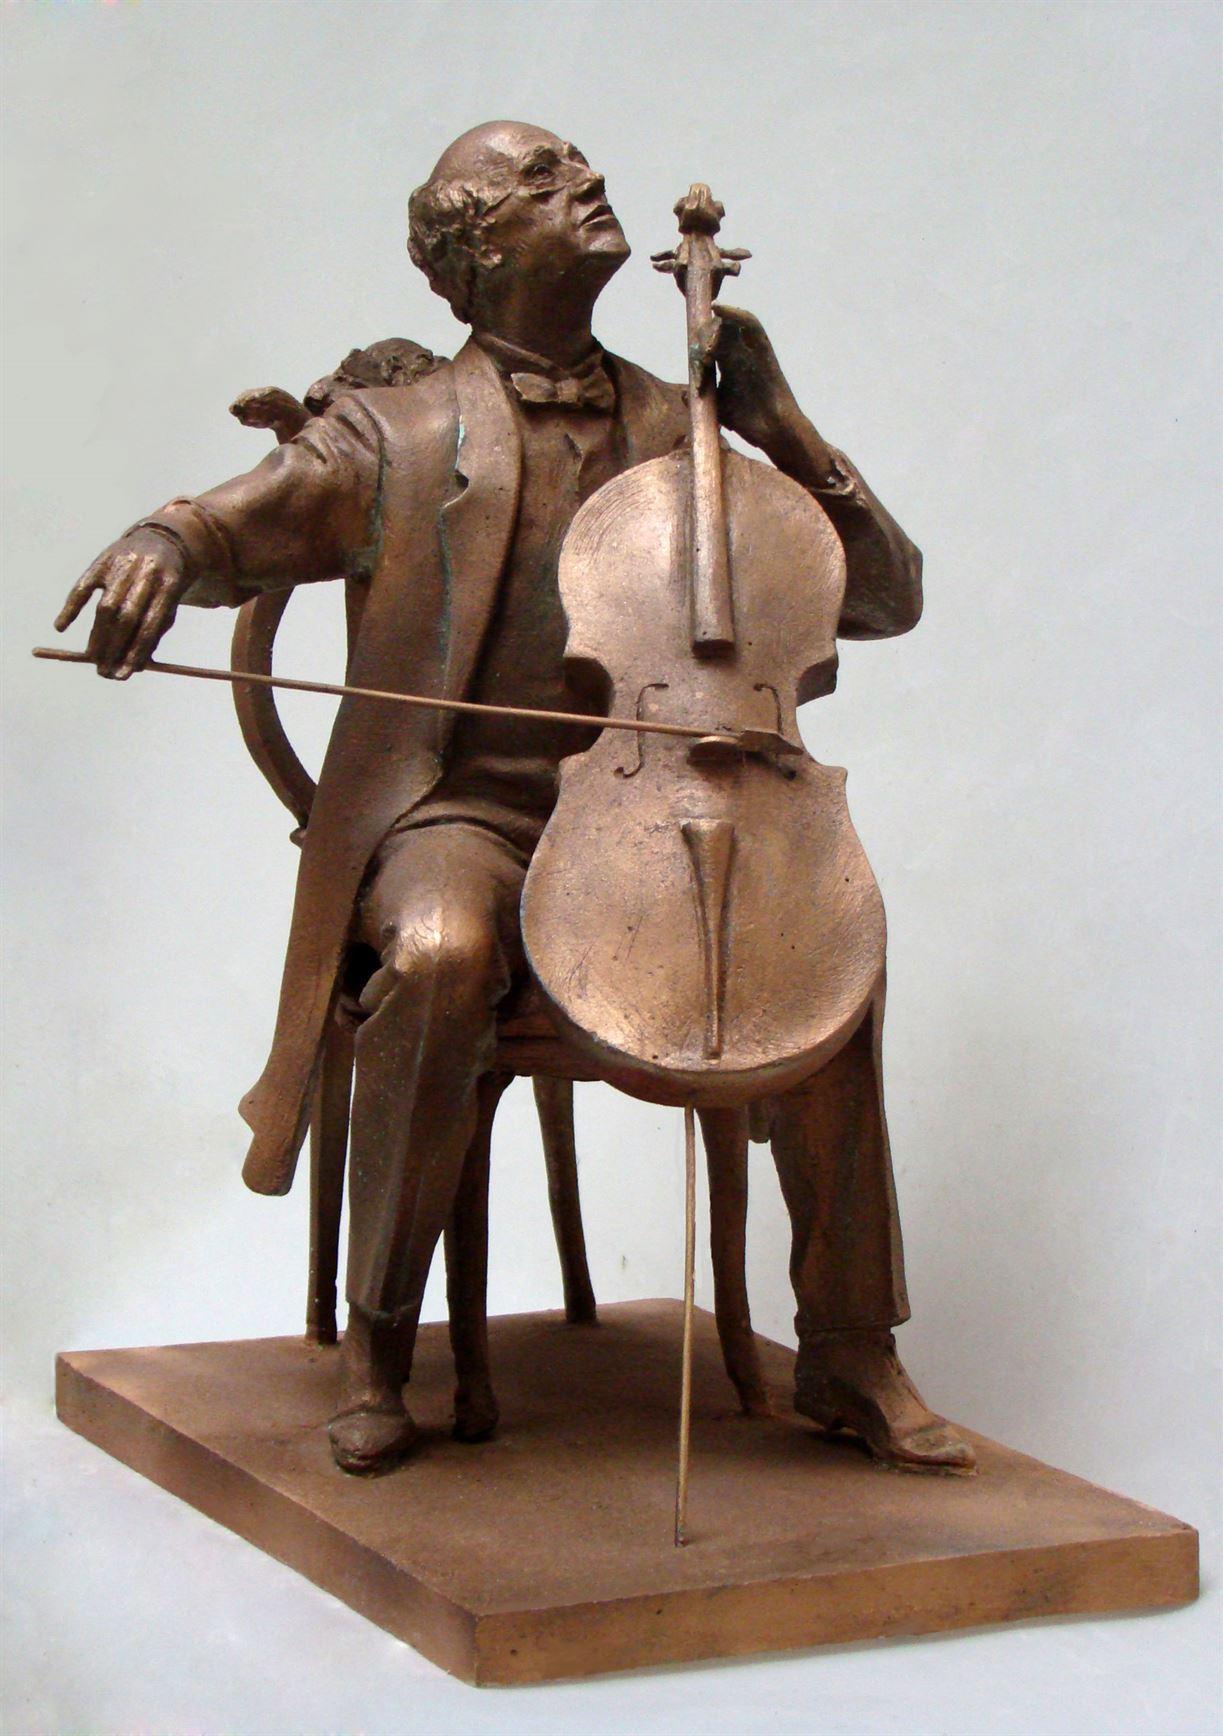 скульптура музыкант